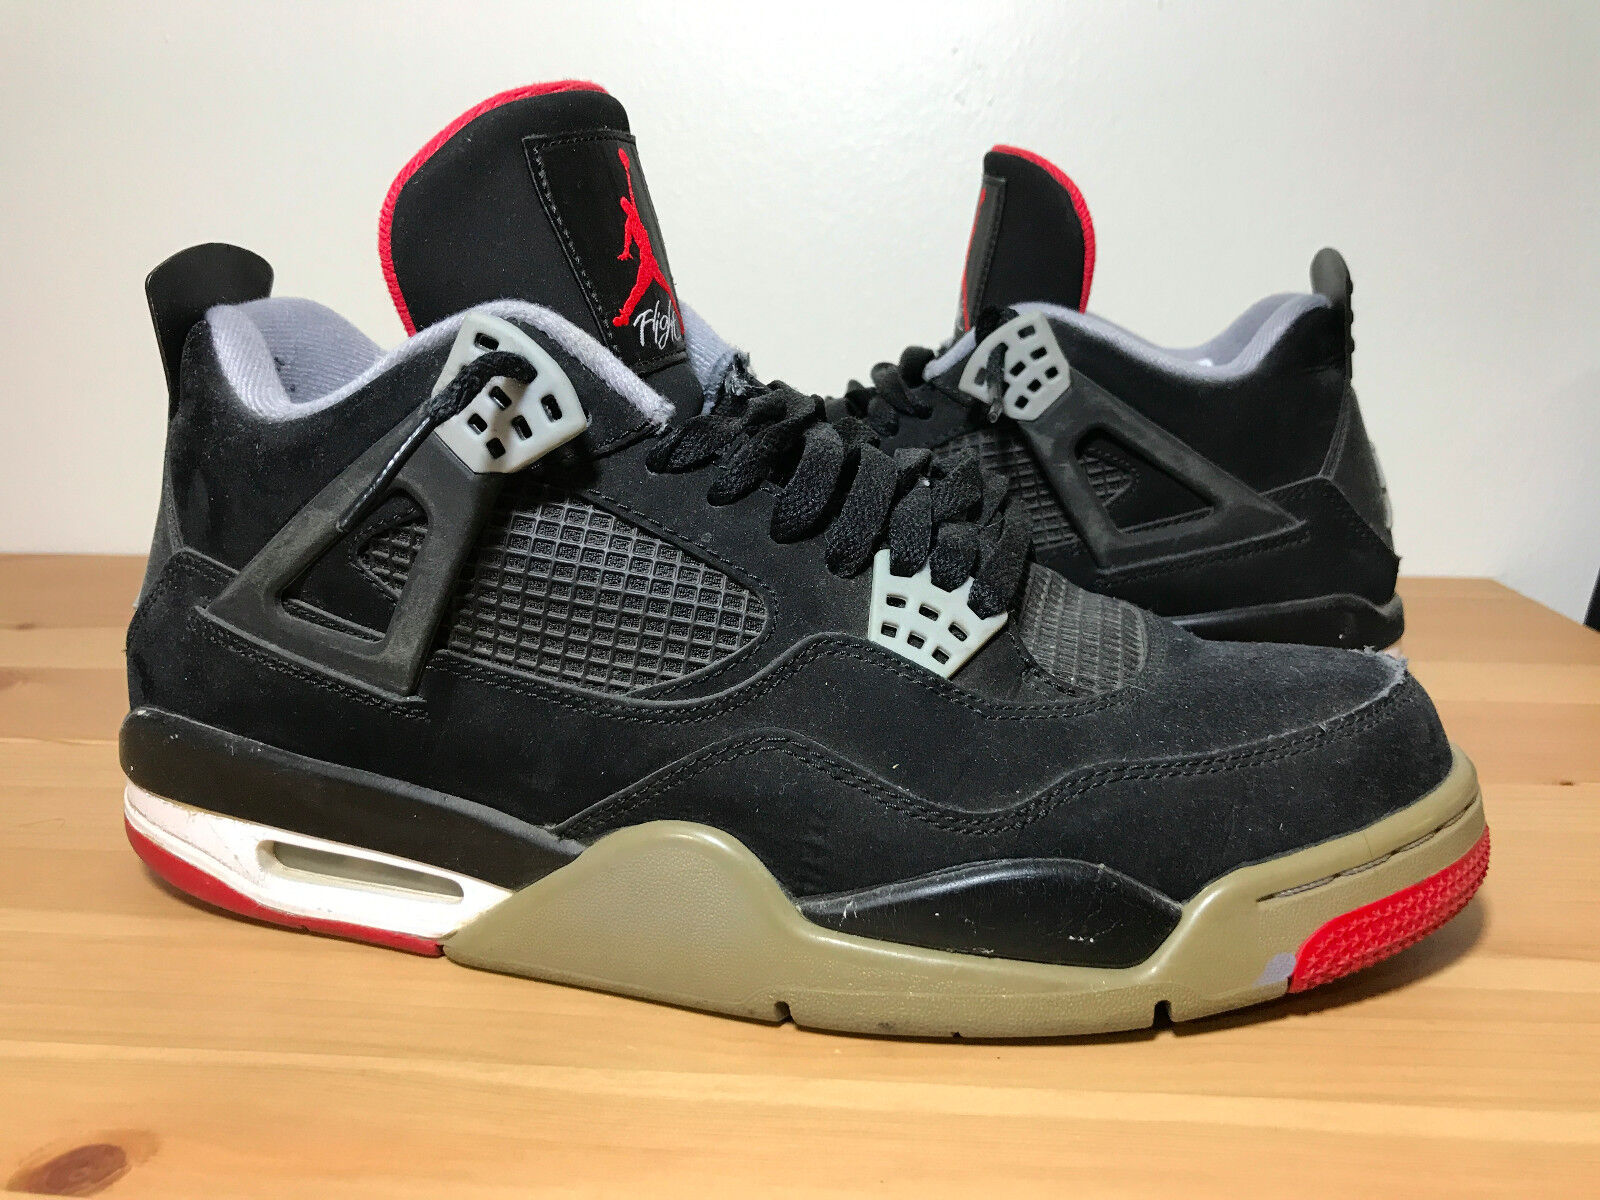 Jordan Retro Iv criados 4 Negro gris Cemento Rojo 308497-089